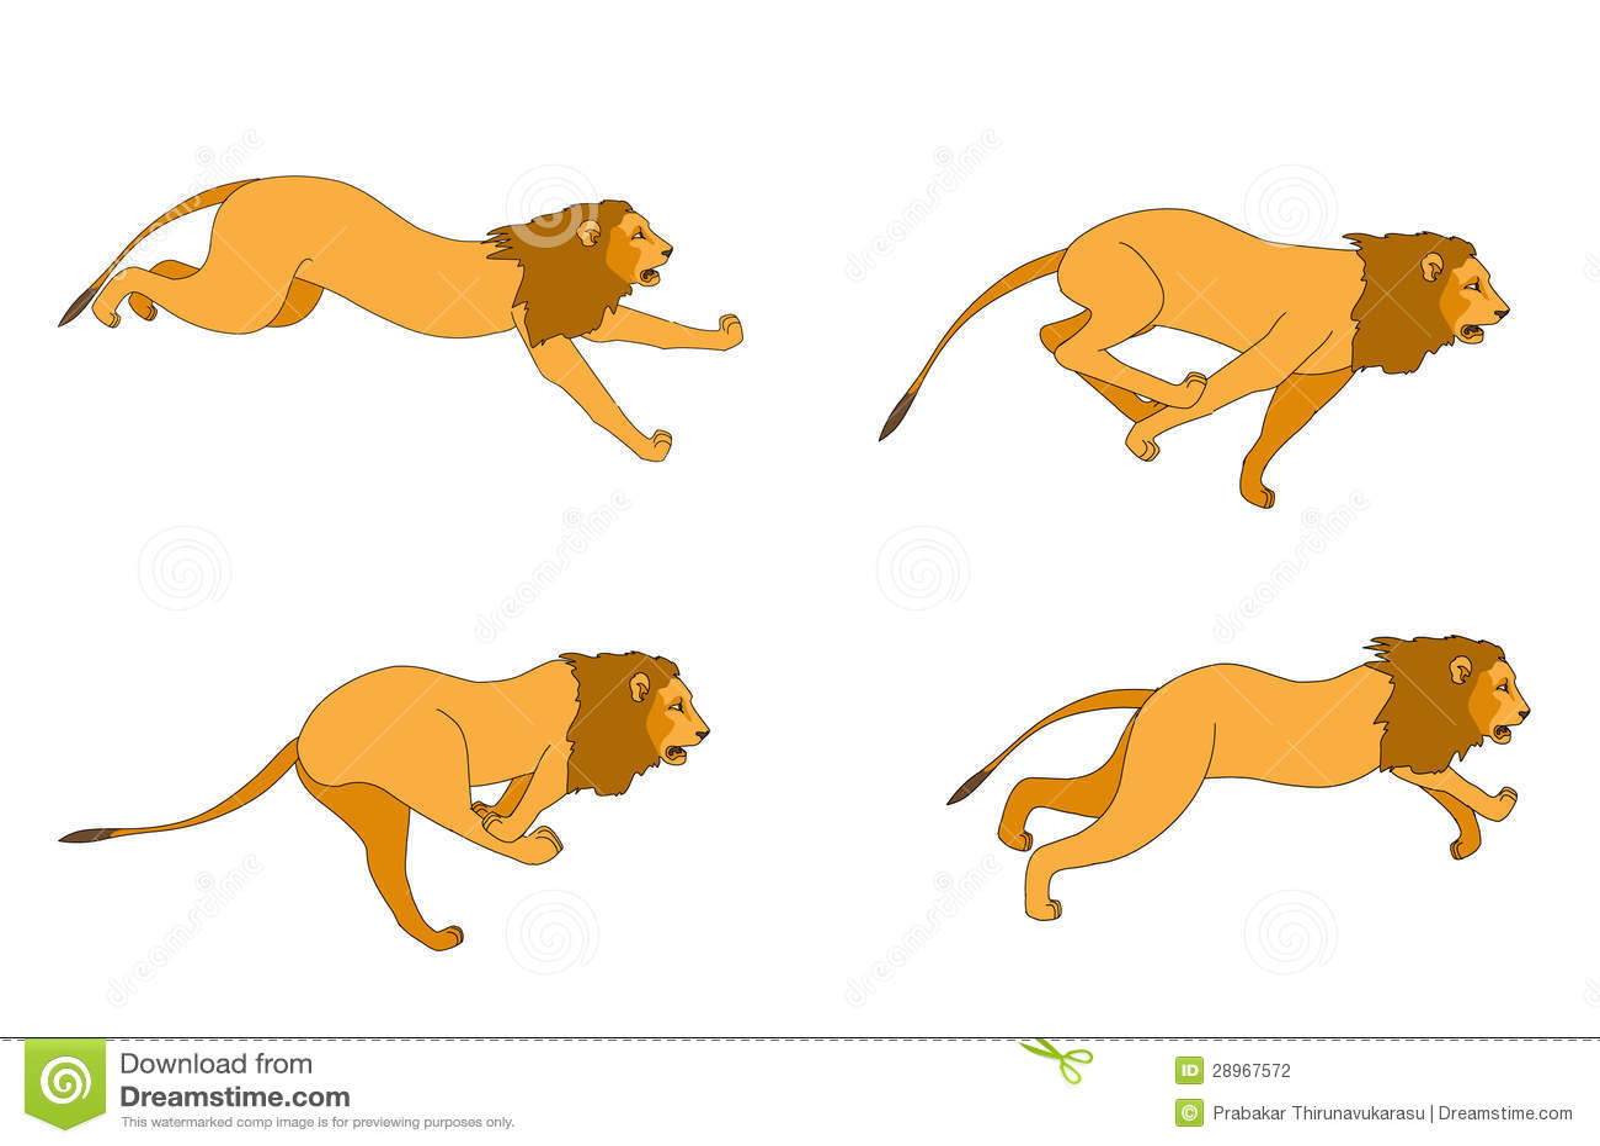 53 Majestic Lion Photos  Pexels  Free Stock Photos